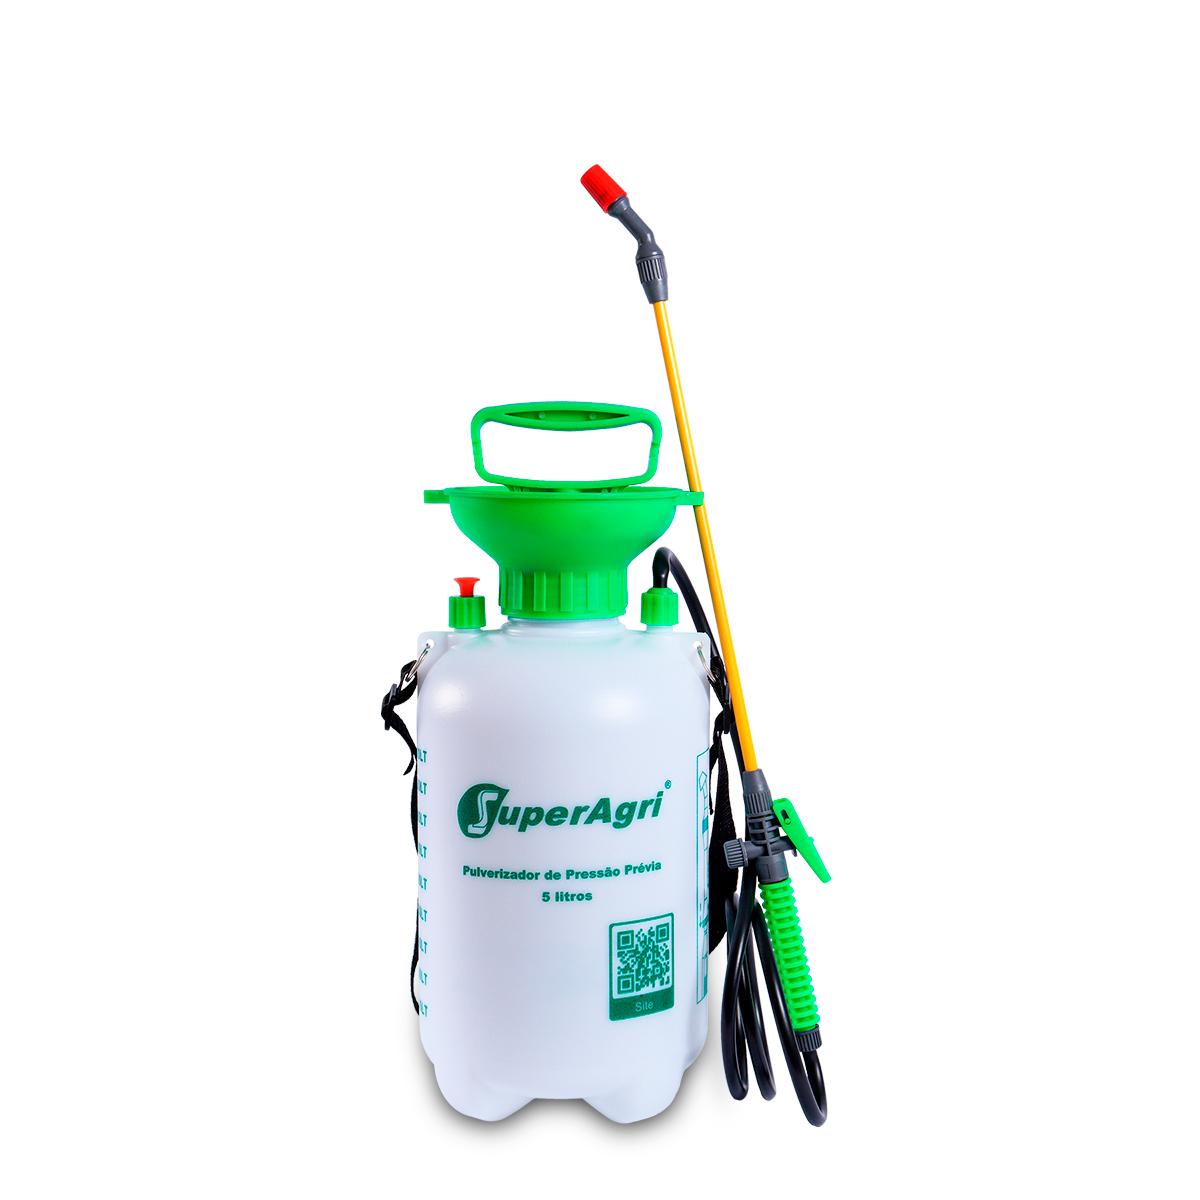 Kit Dux Defender Dul Germ H 5 Litros + Pulverizador Pressão Acumulada 5 Litros SuperAgri SAPPA5L